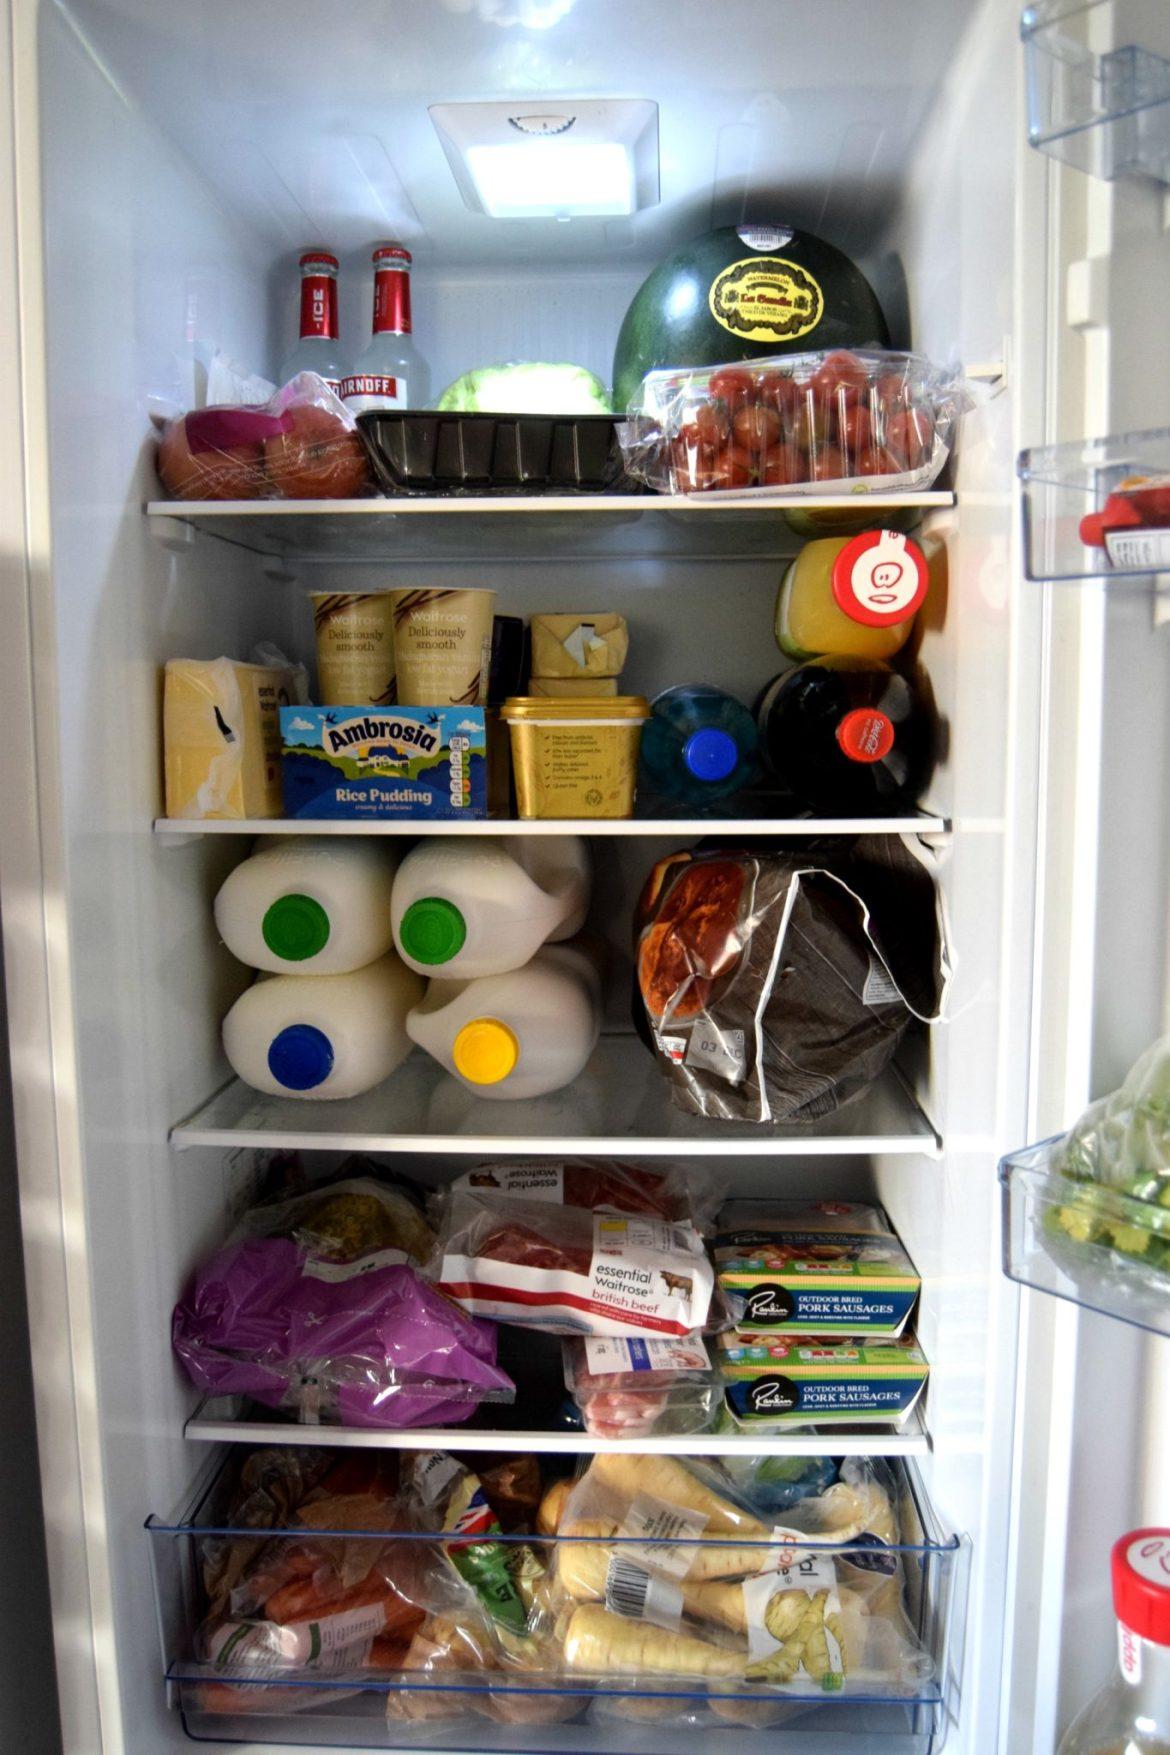 Fridgemaster MC5526470/30 Fridge Freezer shelving